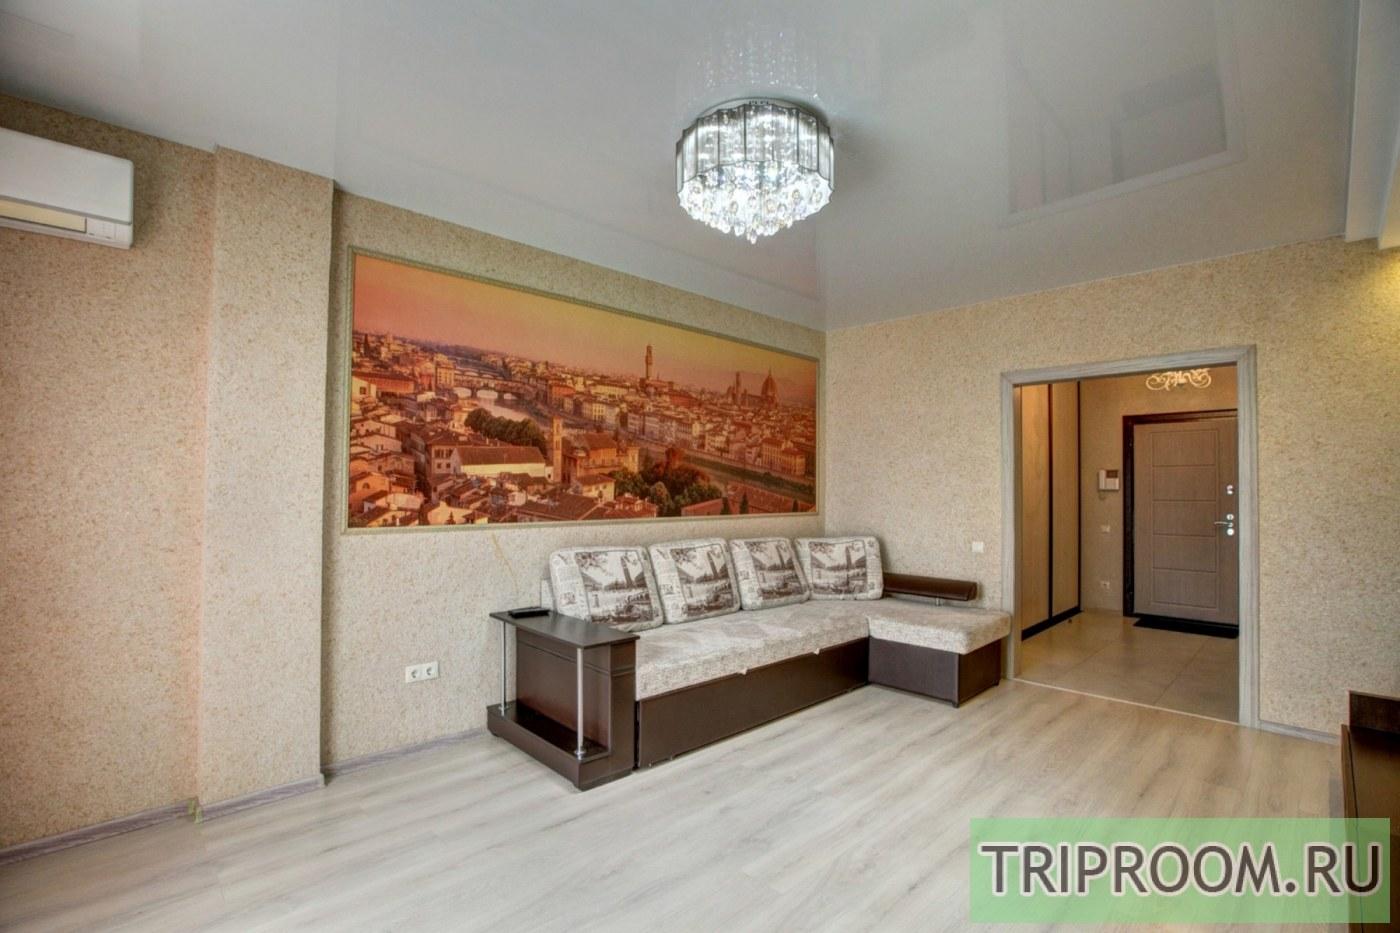 1-комнатная квартира посуточно (вариант № 38810), ул. Революции проспект, фото № 3